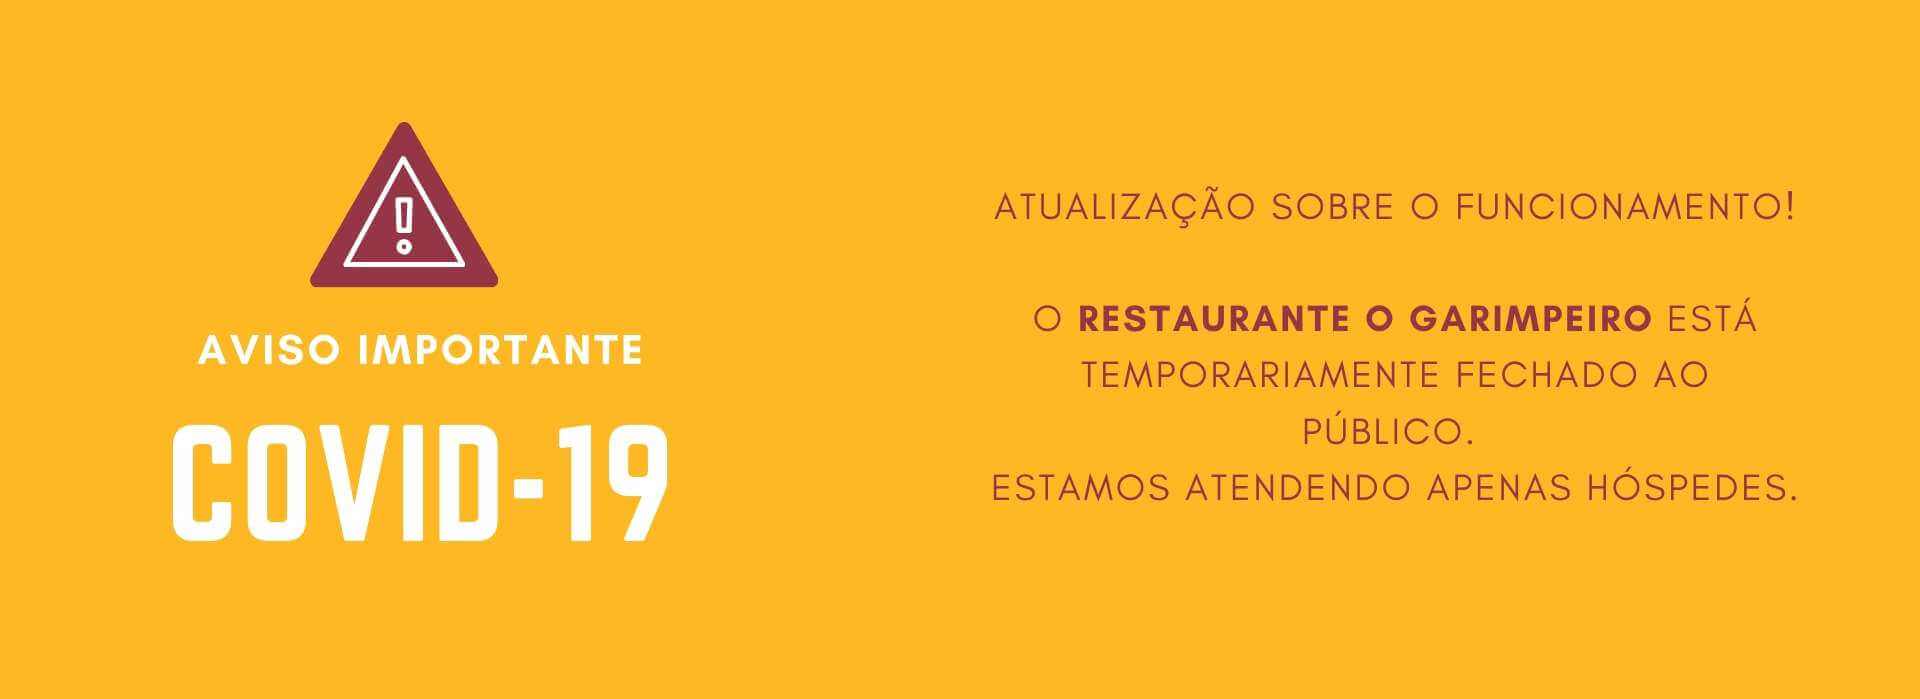 banner-home-restaurante-covid2